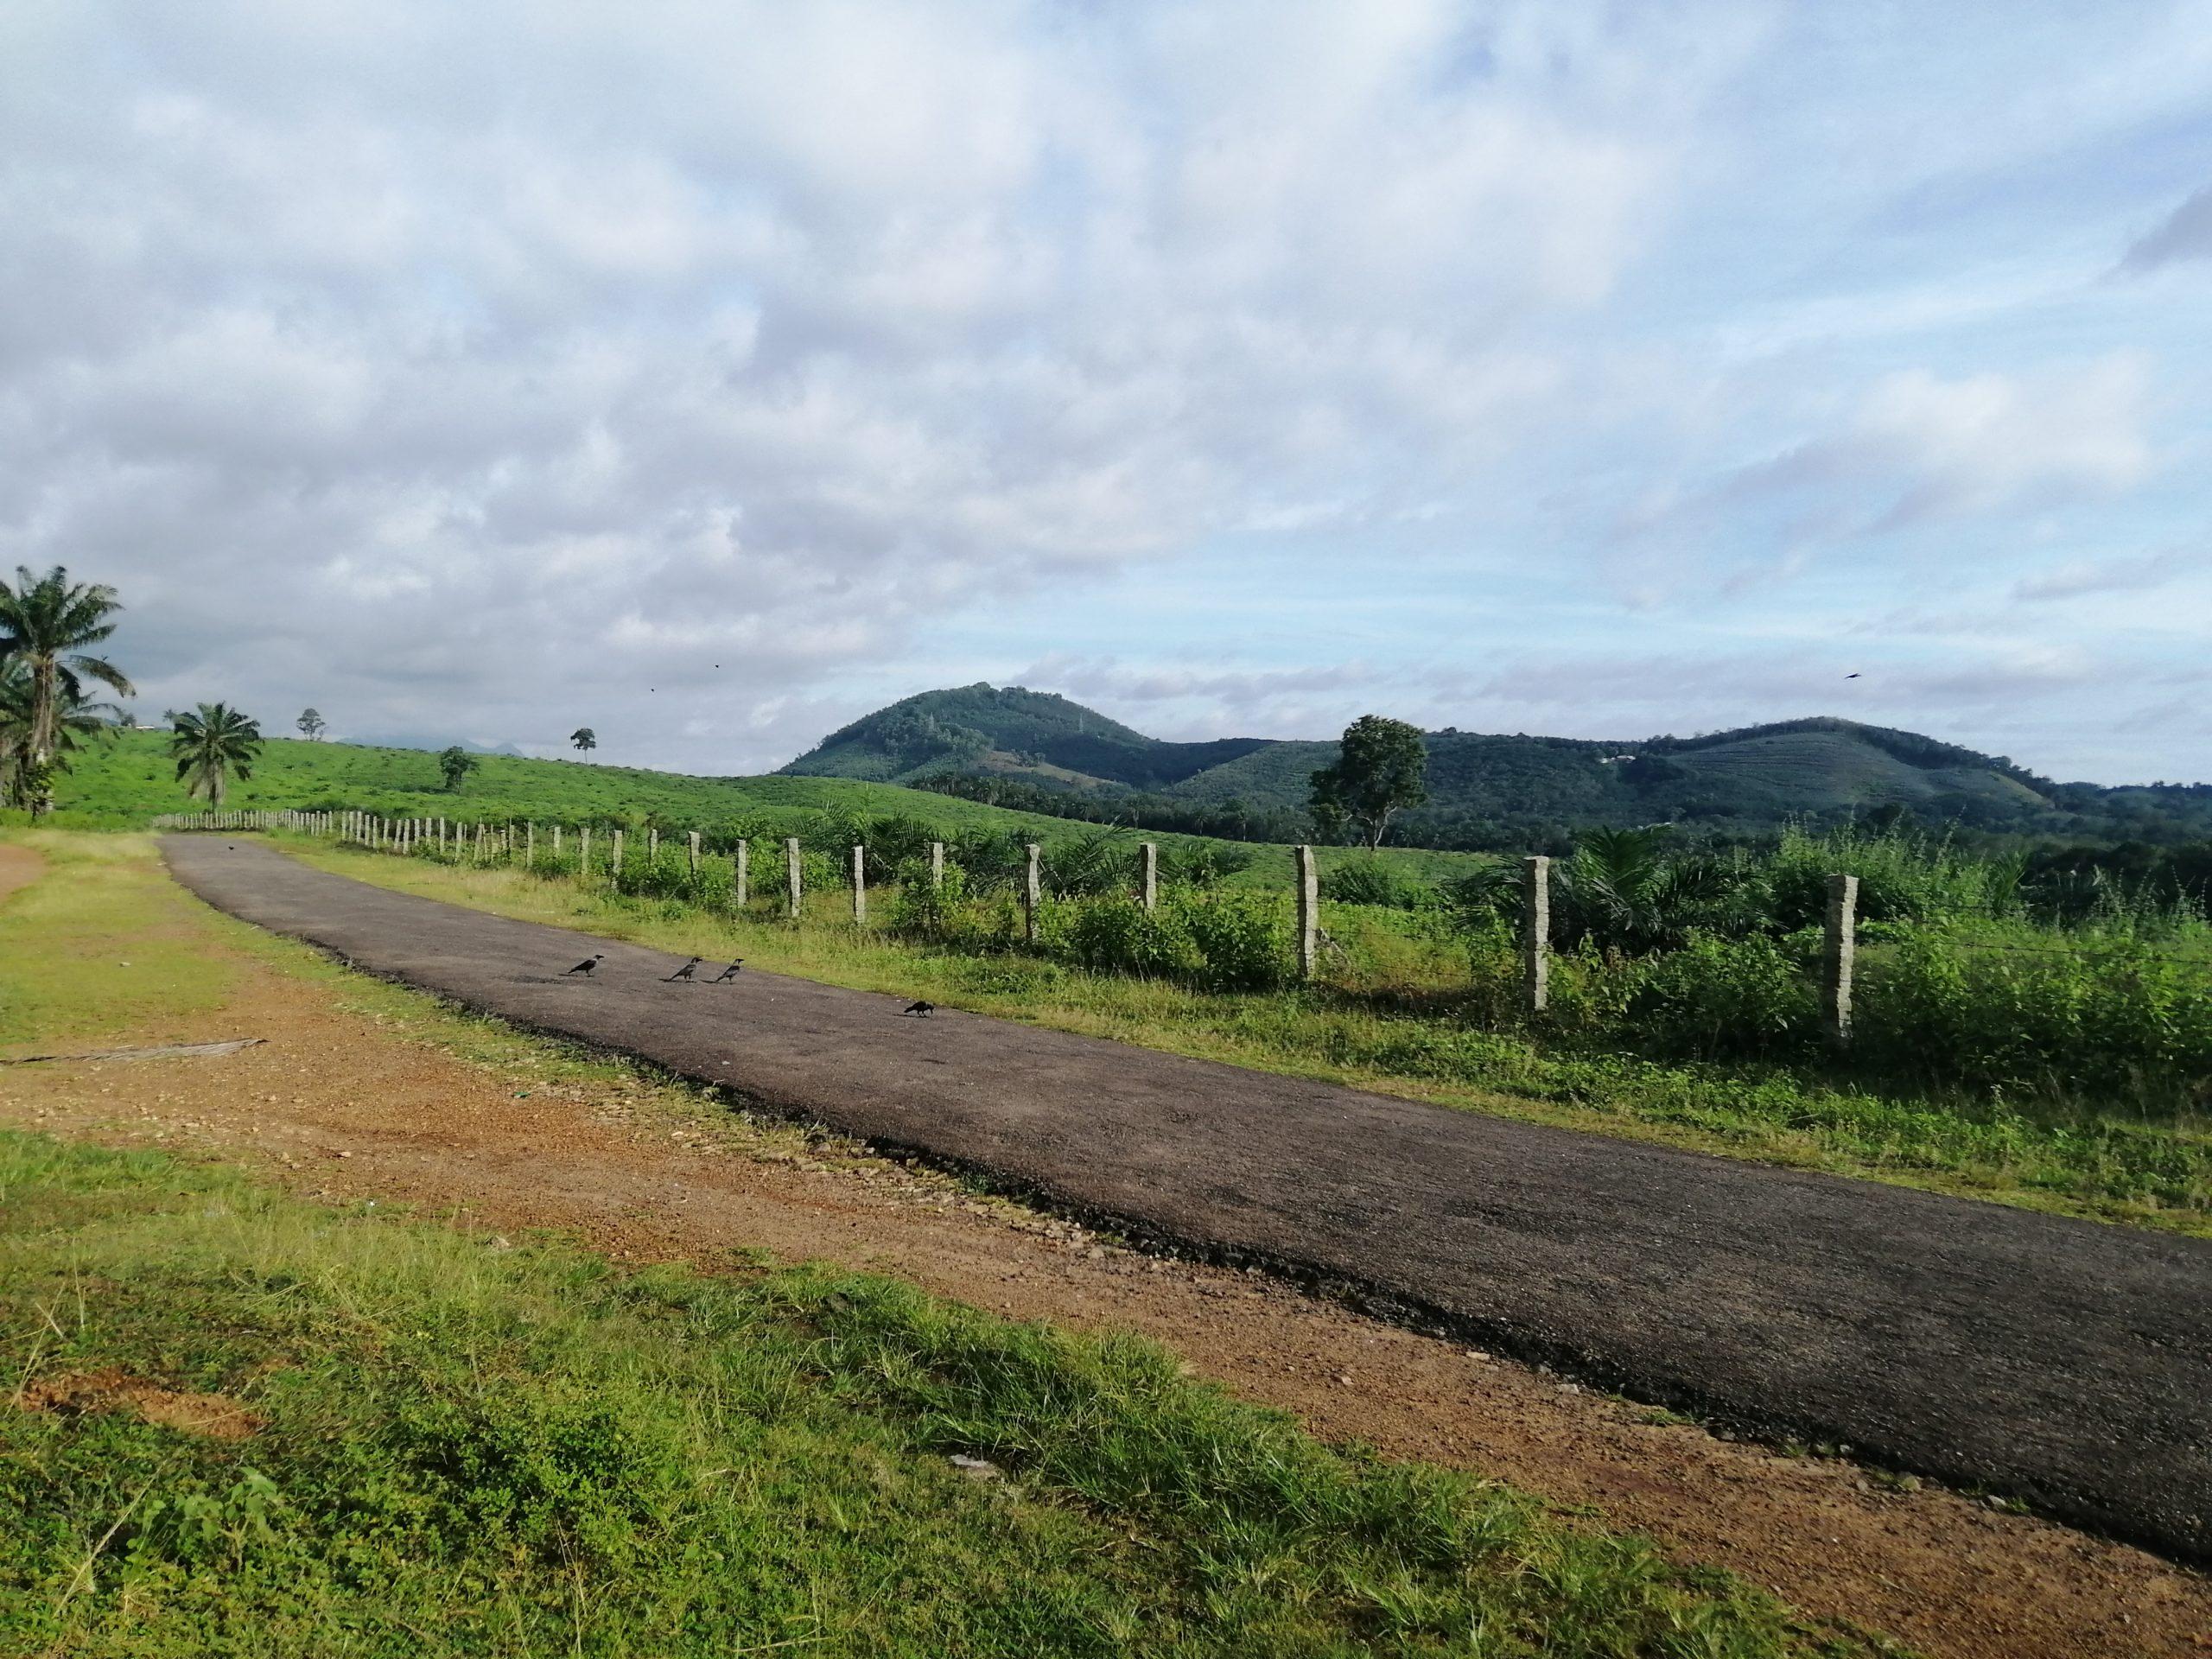 Road on an idyllic place